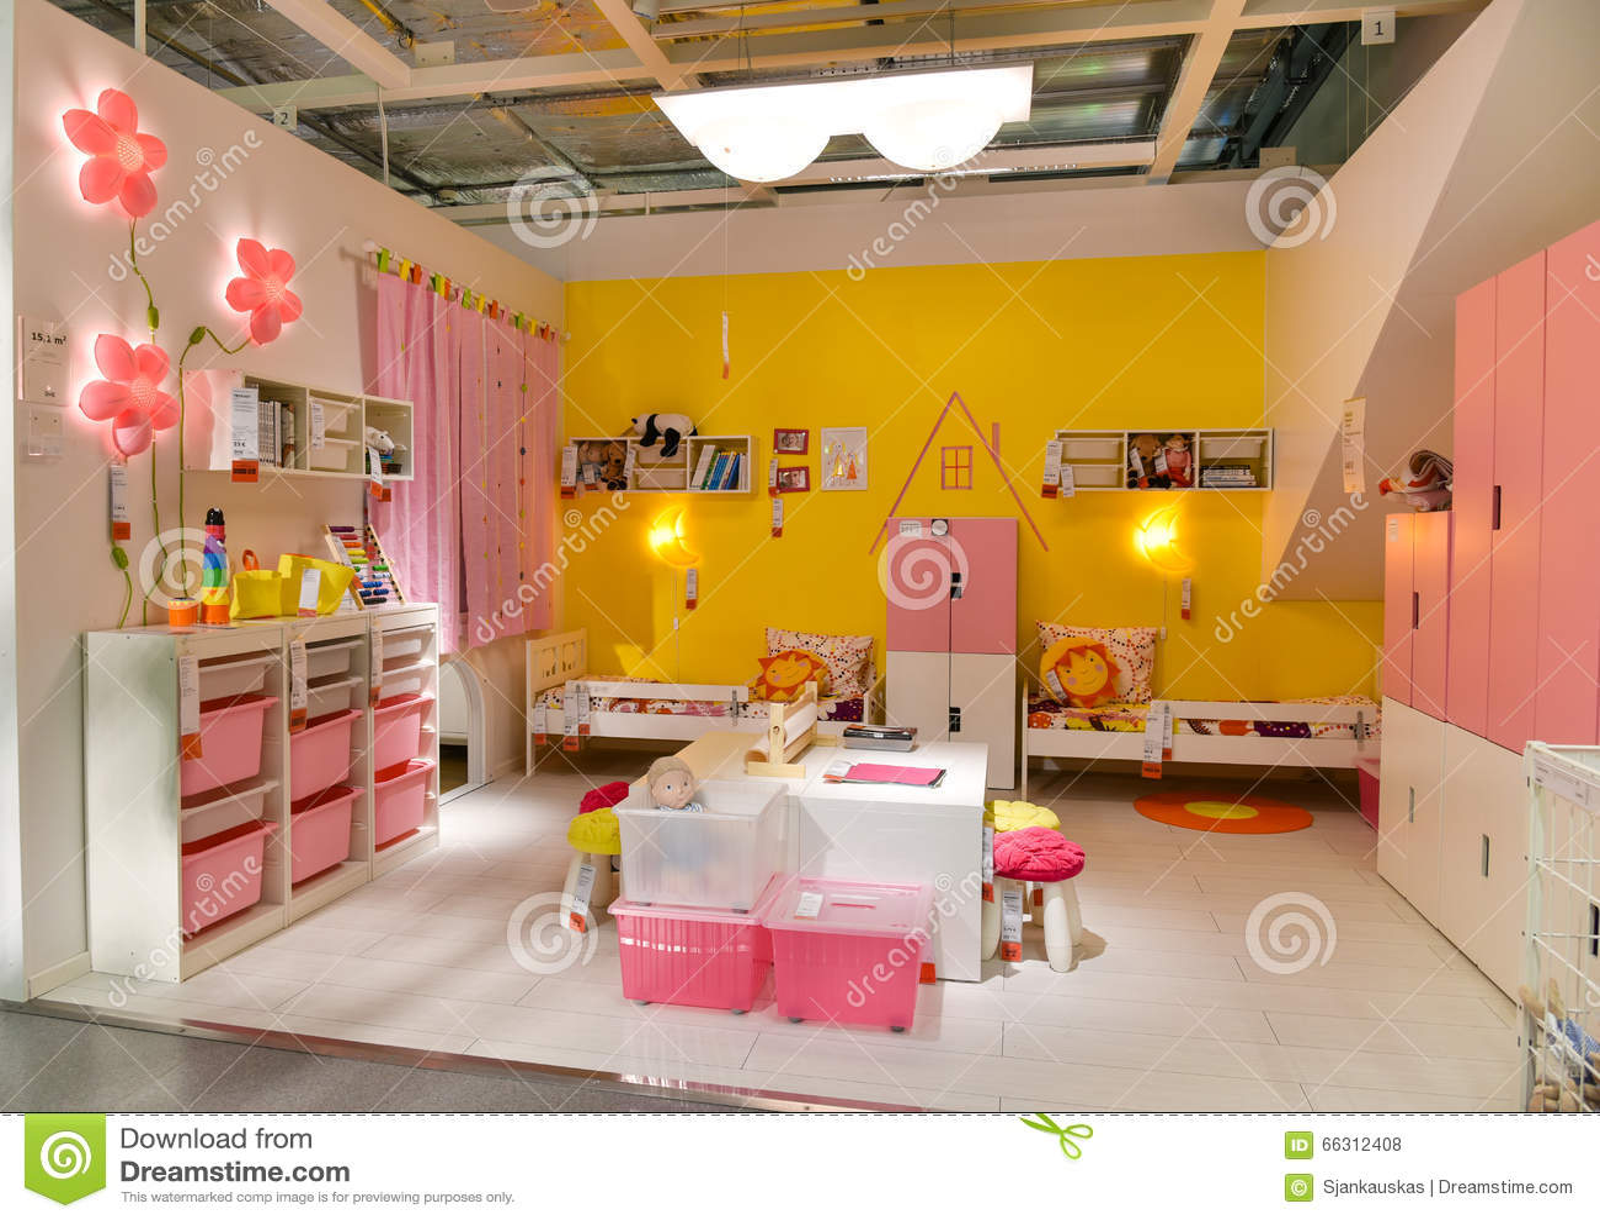 Children Room Furniture In Ikea Editorial Stock Photo Image 66312408